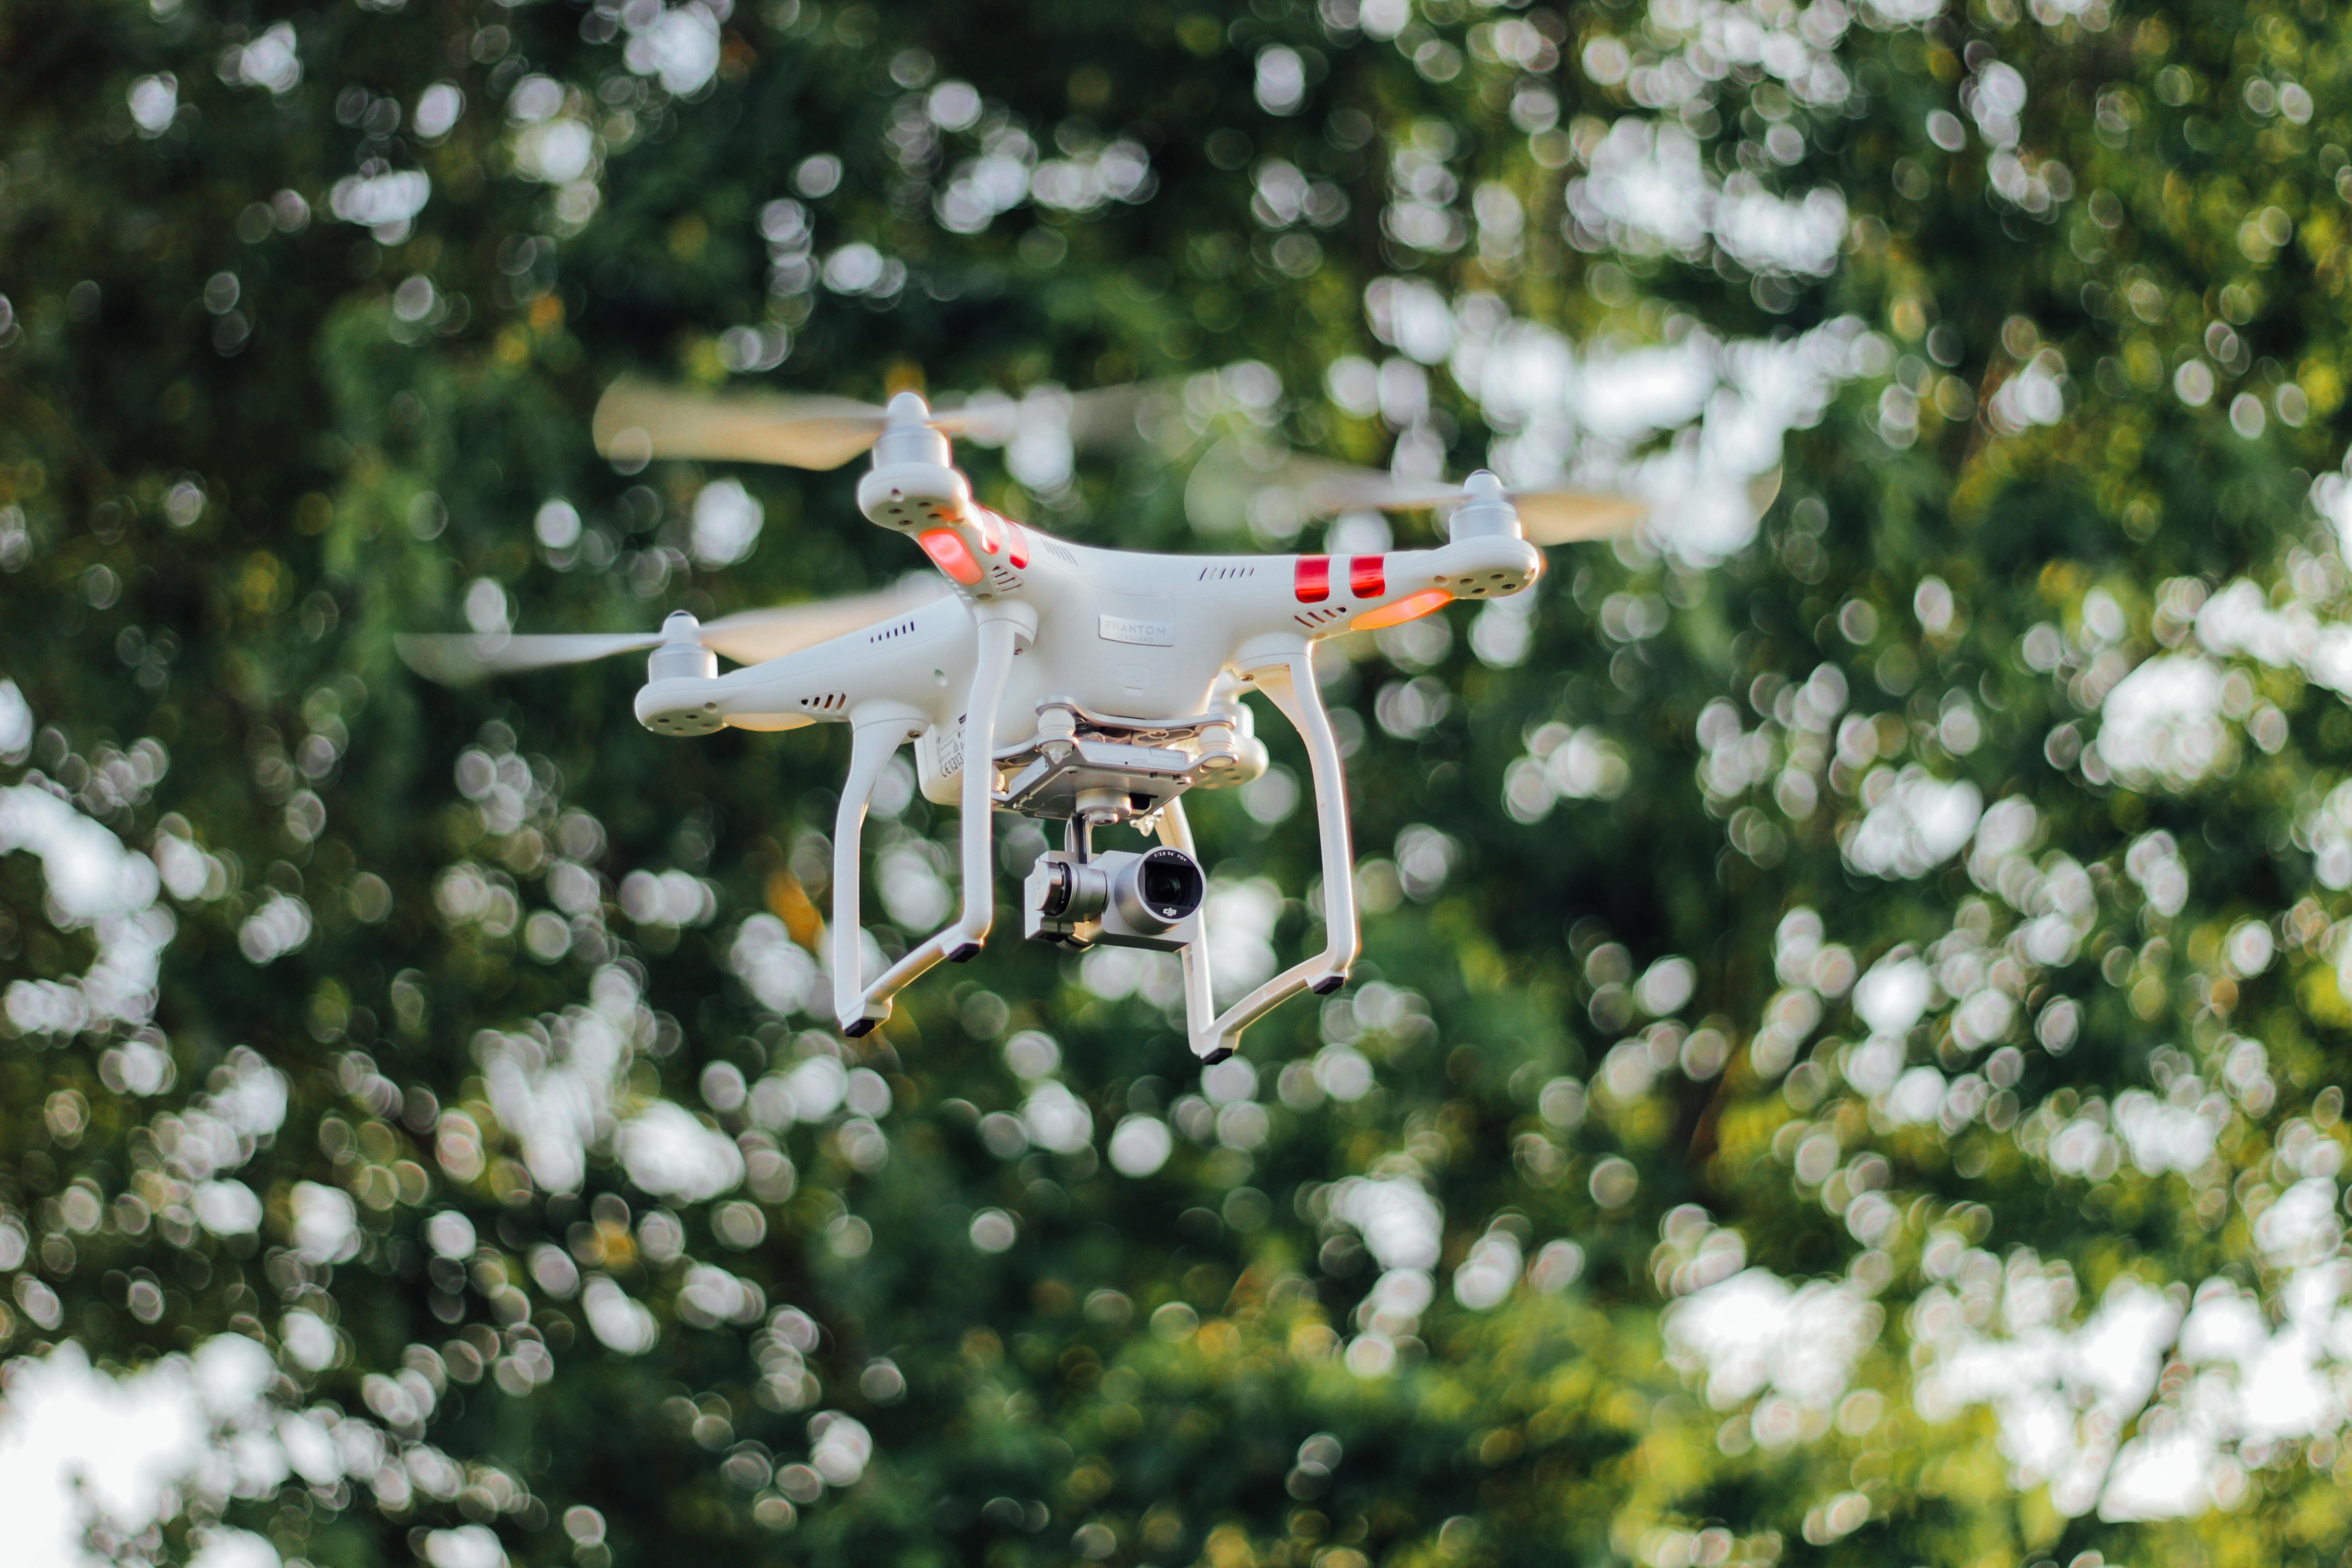 DJI Phantom drone flying midair